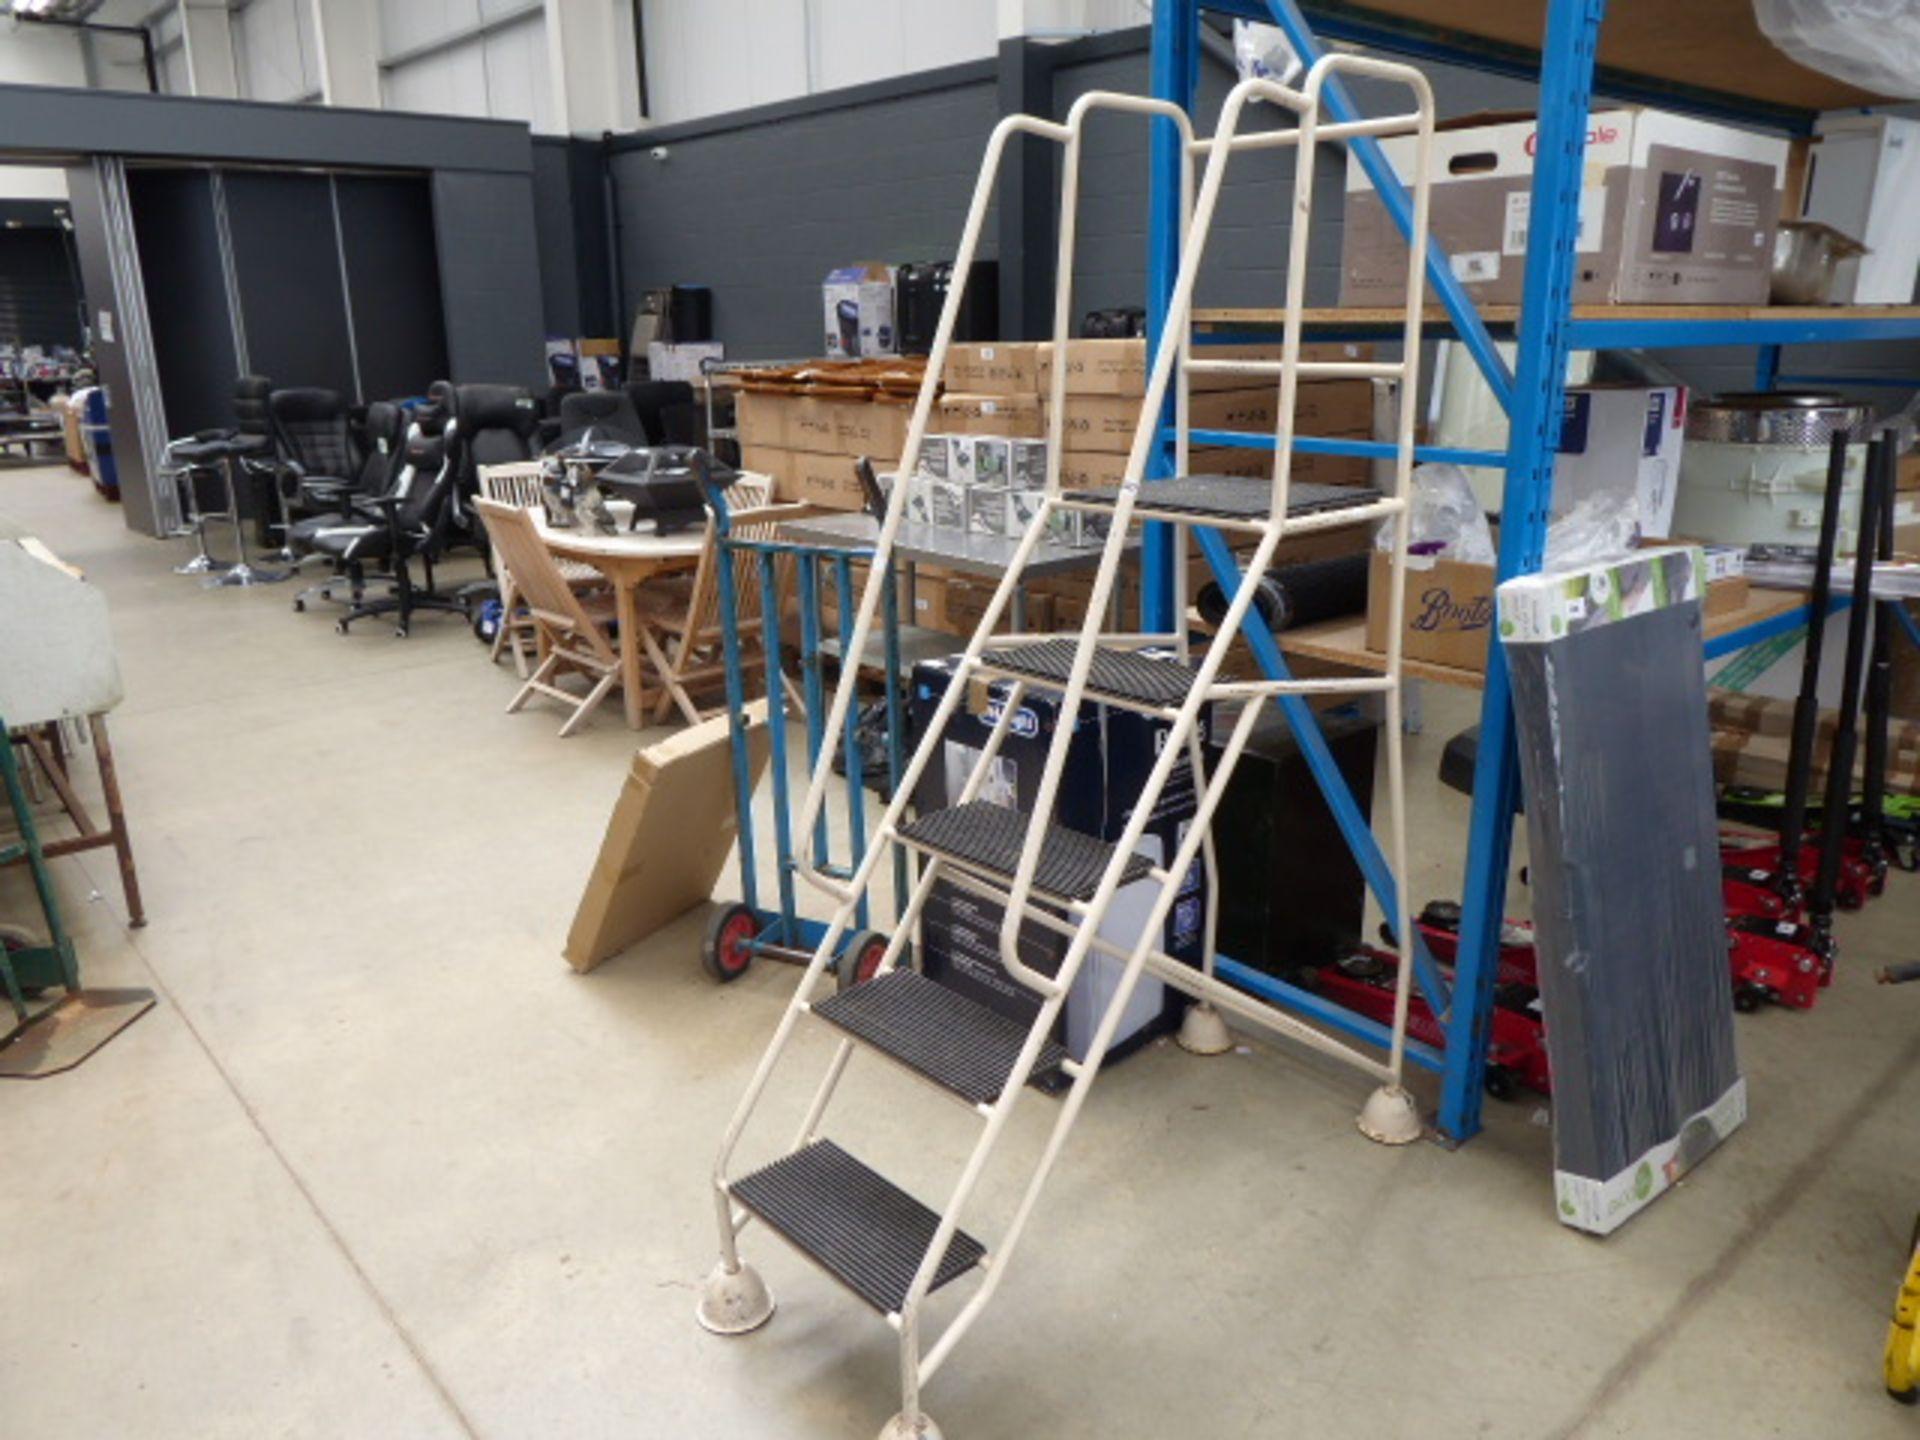 Lot 4537 - Set of warehouse steps